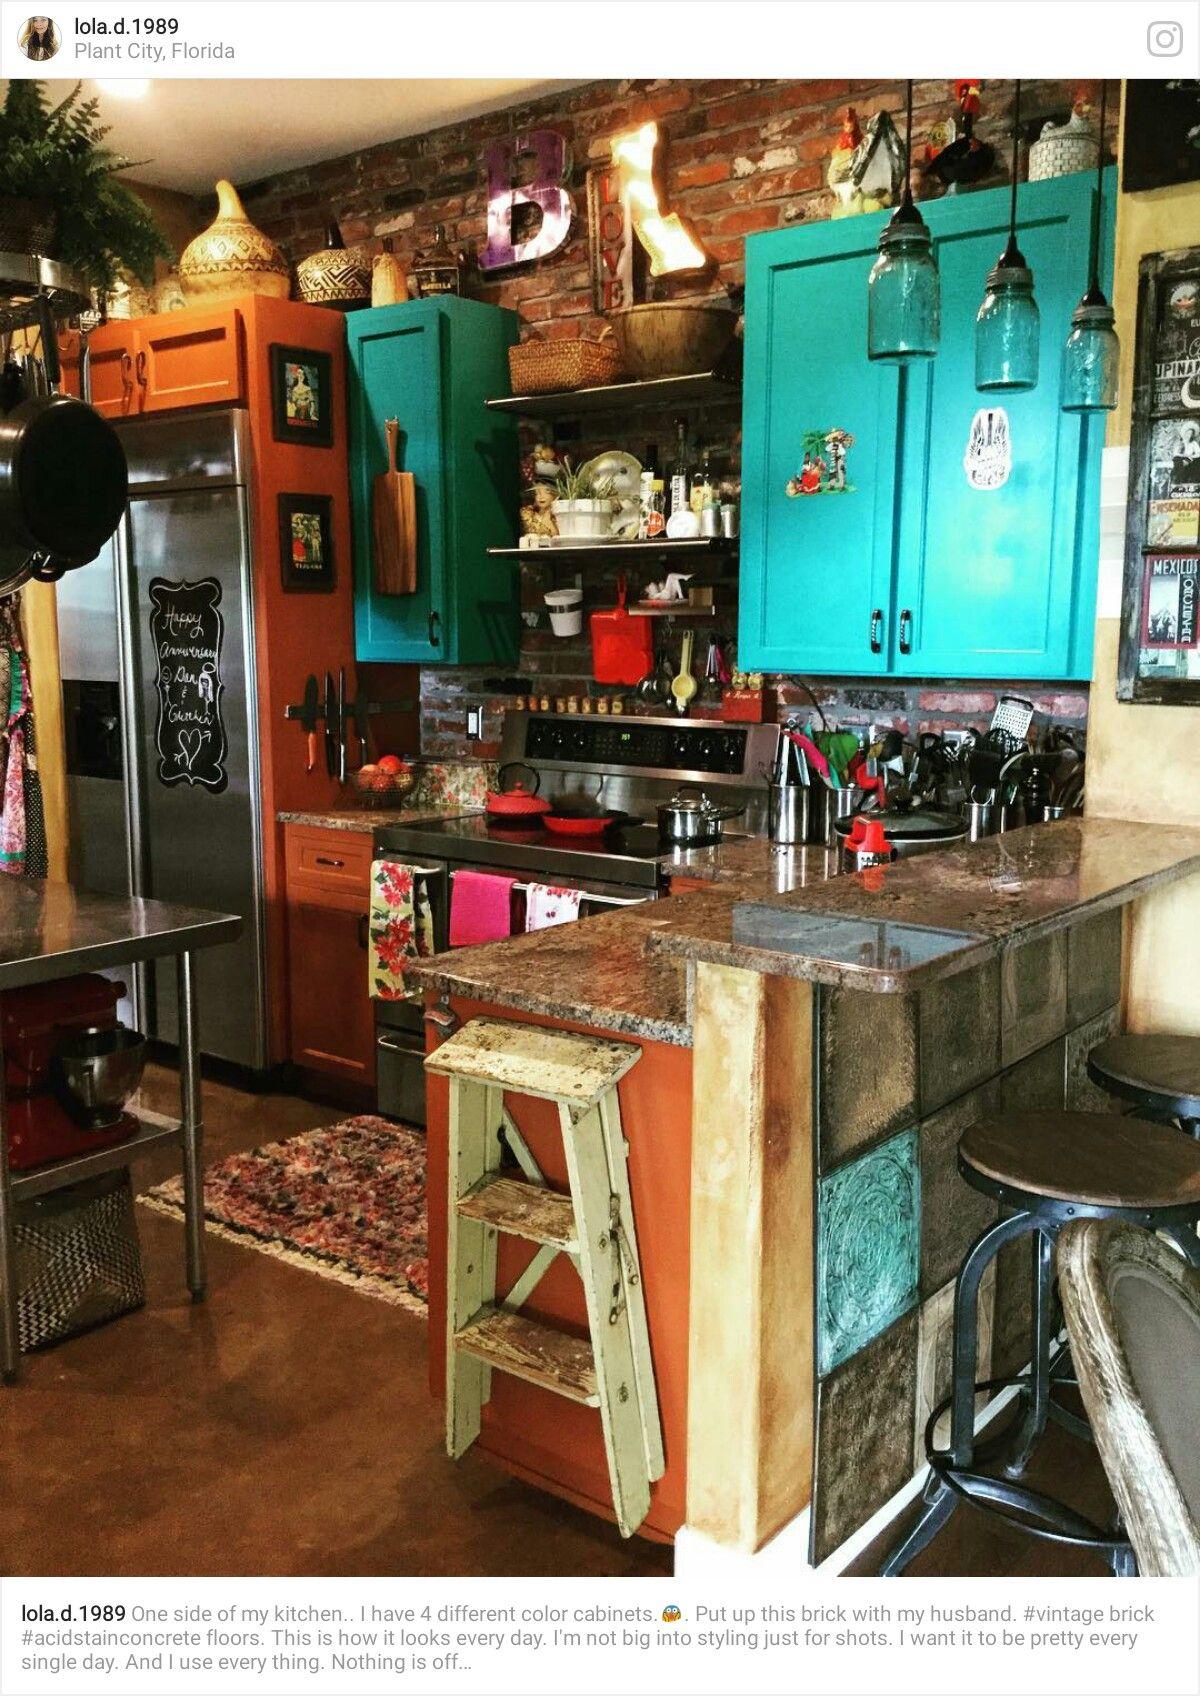 pin by yonnie smith on home bohemian homes bohemian kitchen sweet home boho kitchen on hippie kitchen ideas boho chic id=23007